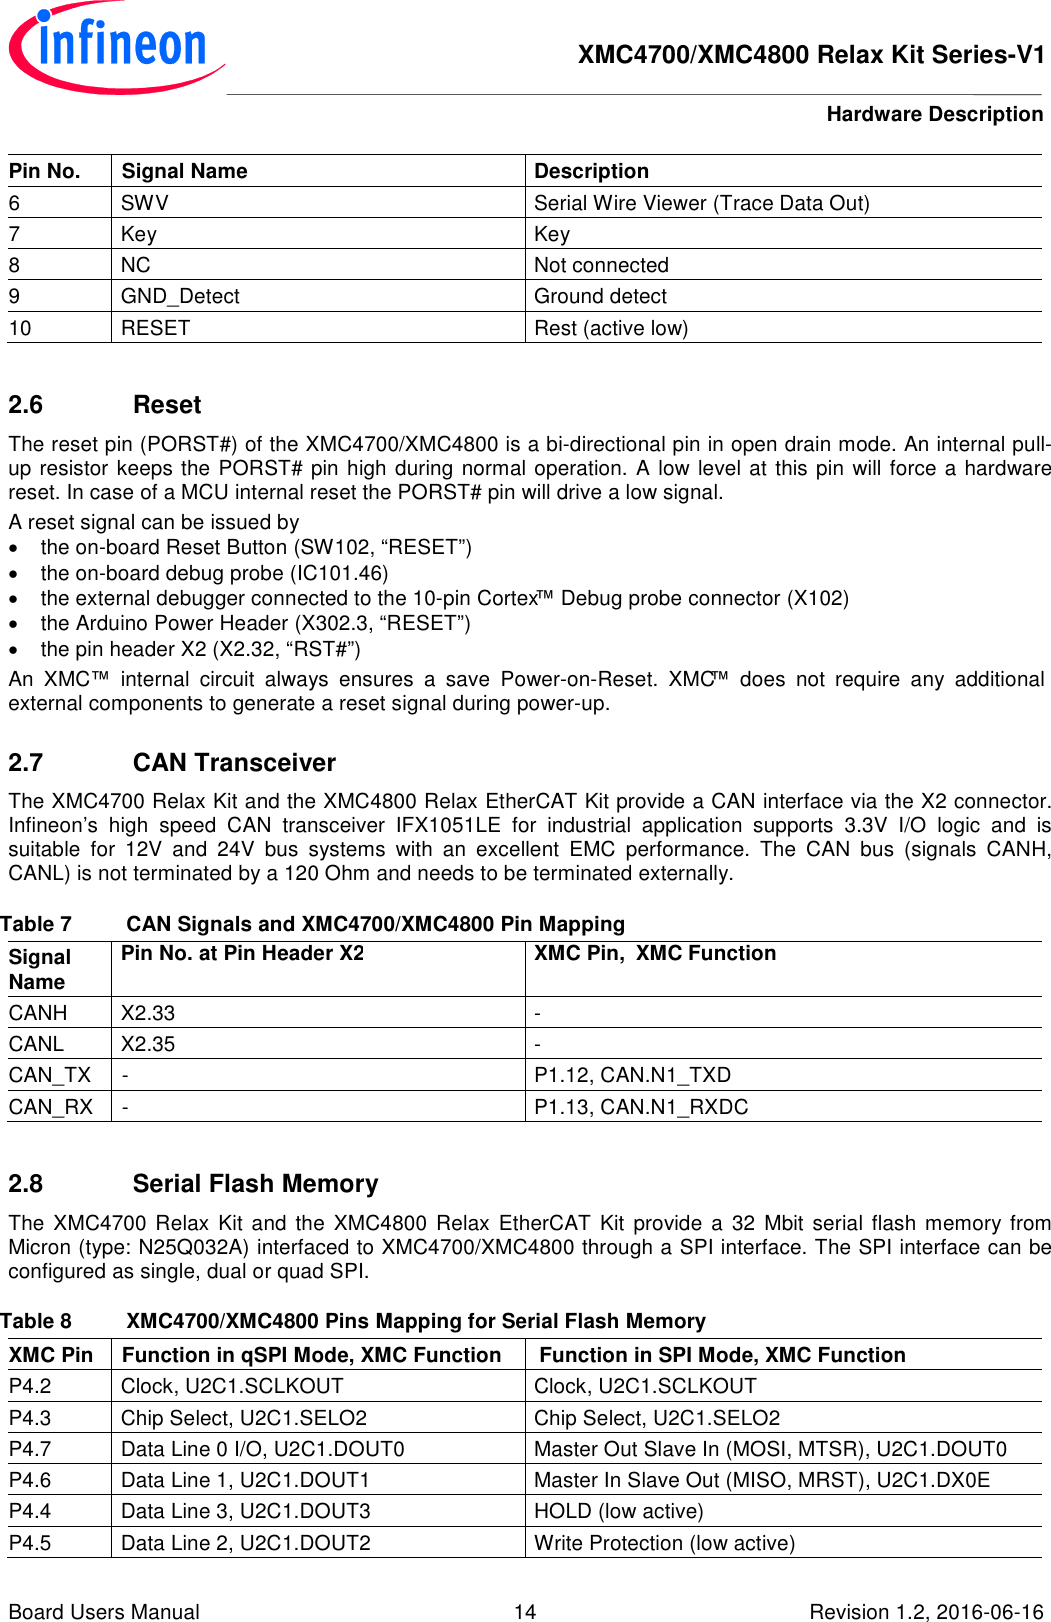 Board_Users_Manual_XMC4700_XMC4800_Relax_Kit_Series V1_R1 2x